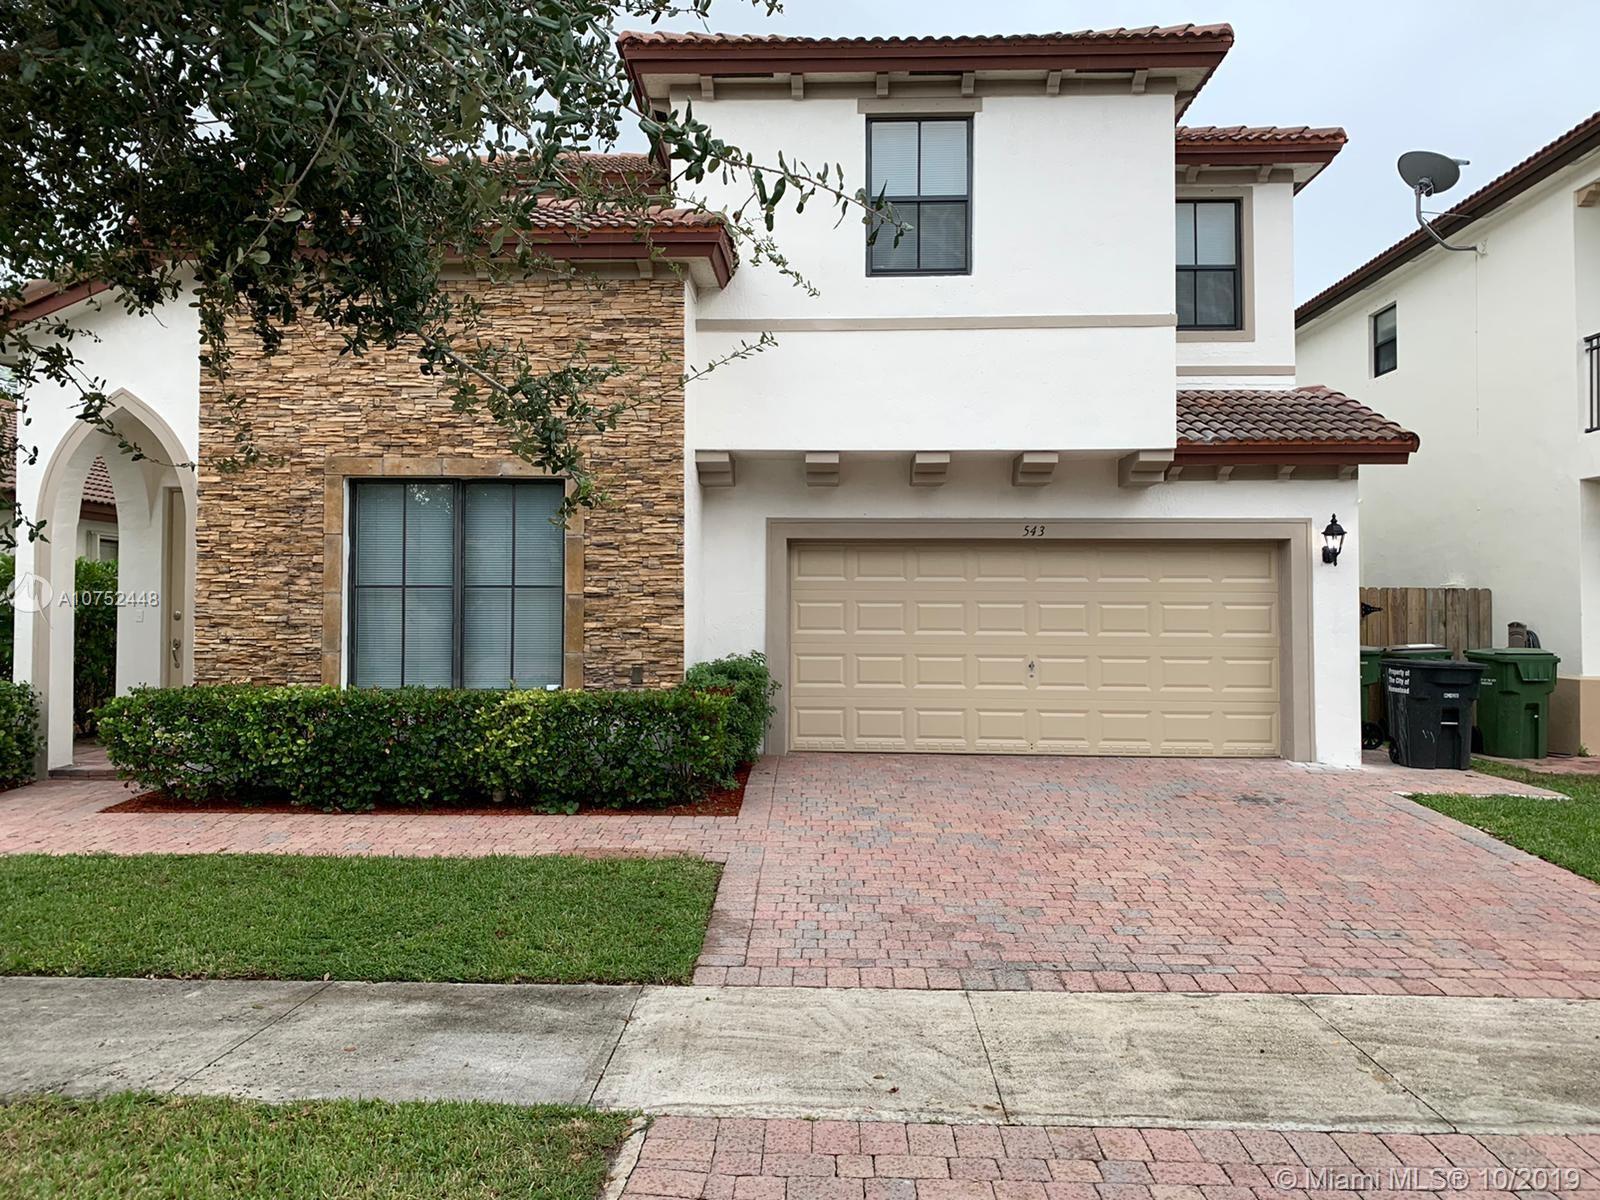 543 SE 37th Pl, Homestead, FL 33033 - Homestead, FL real estate listing